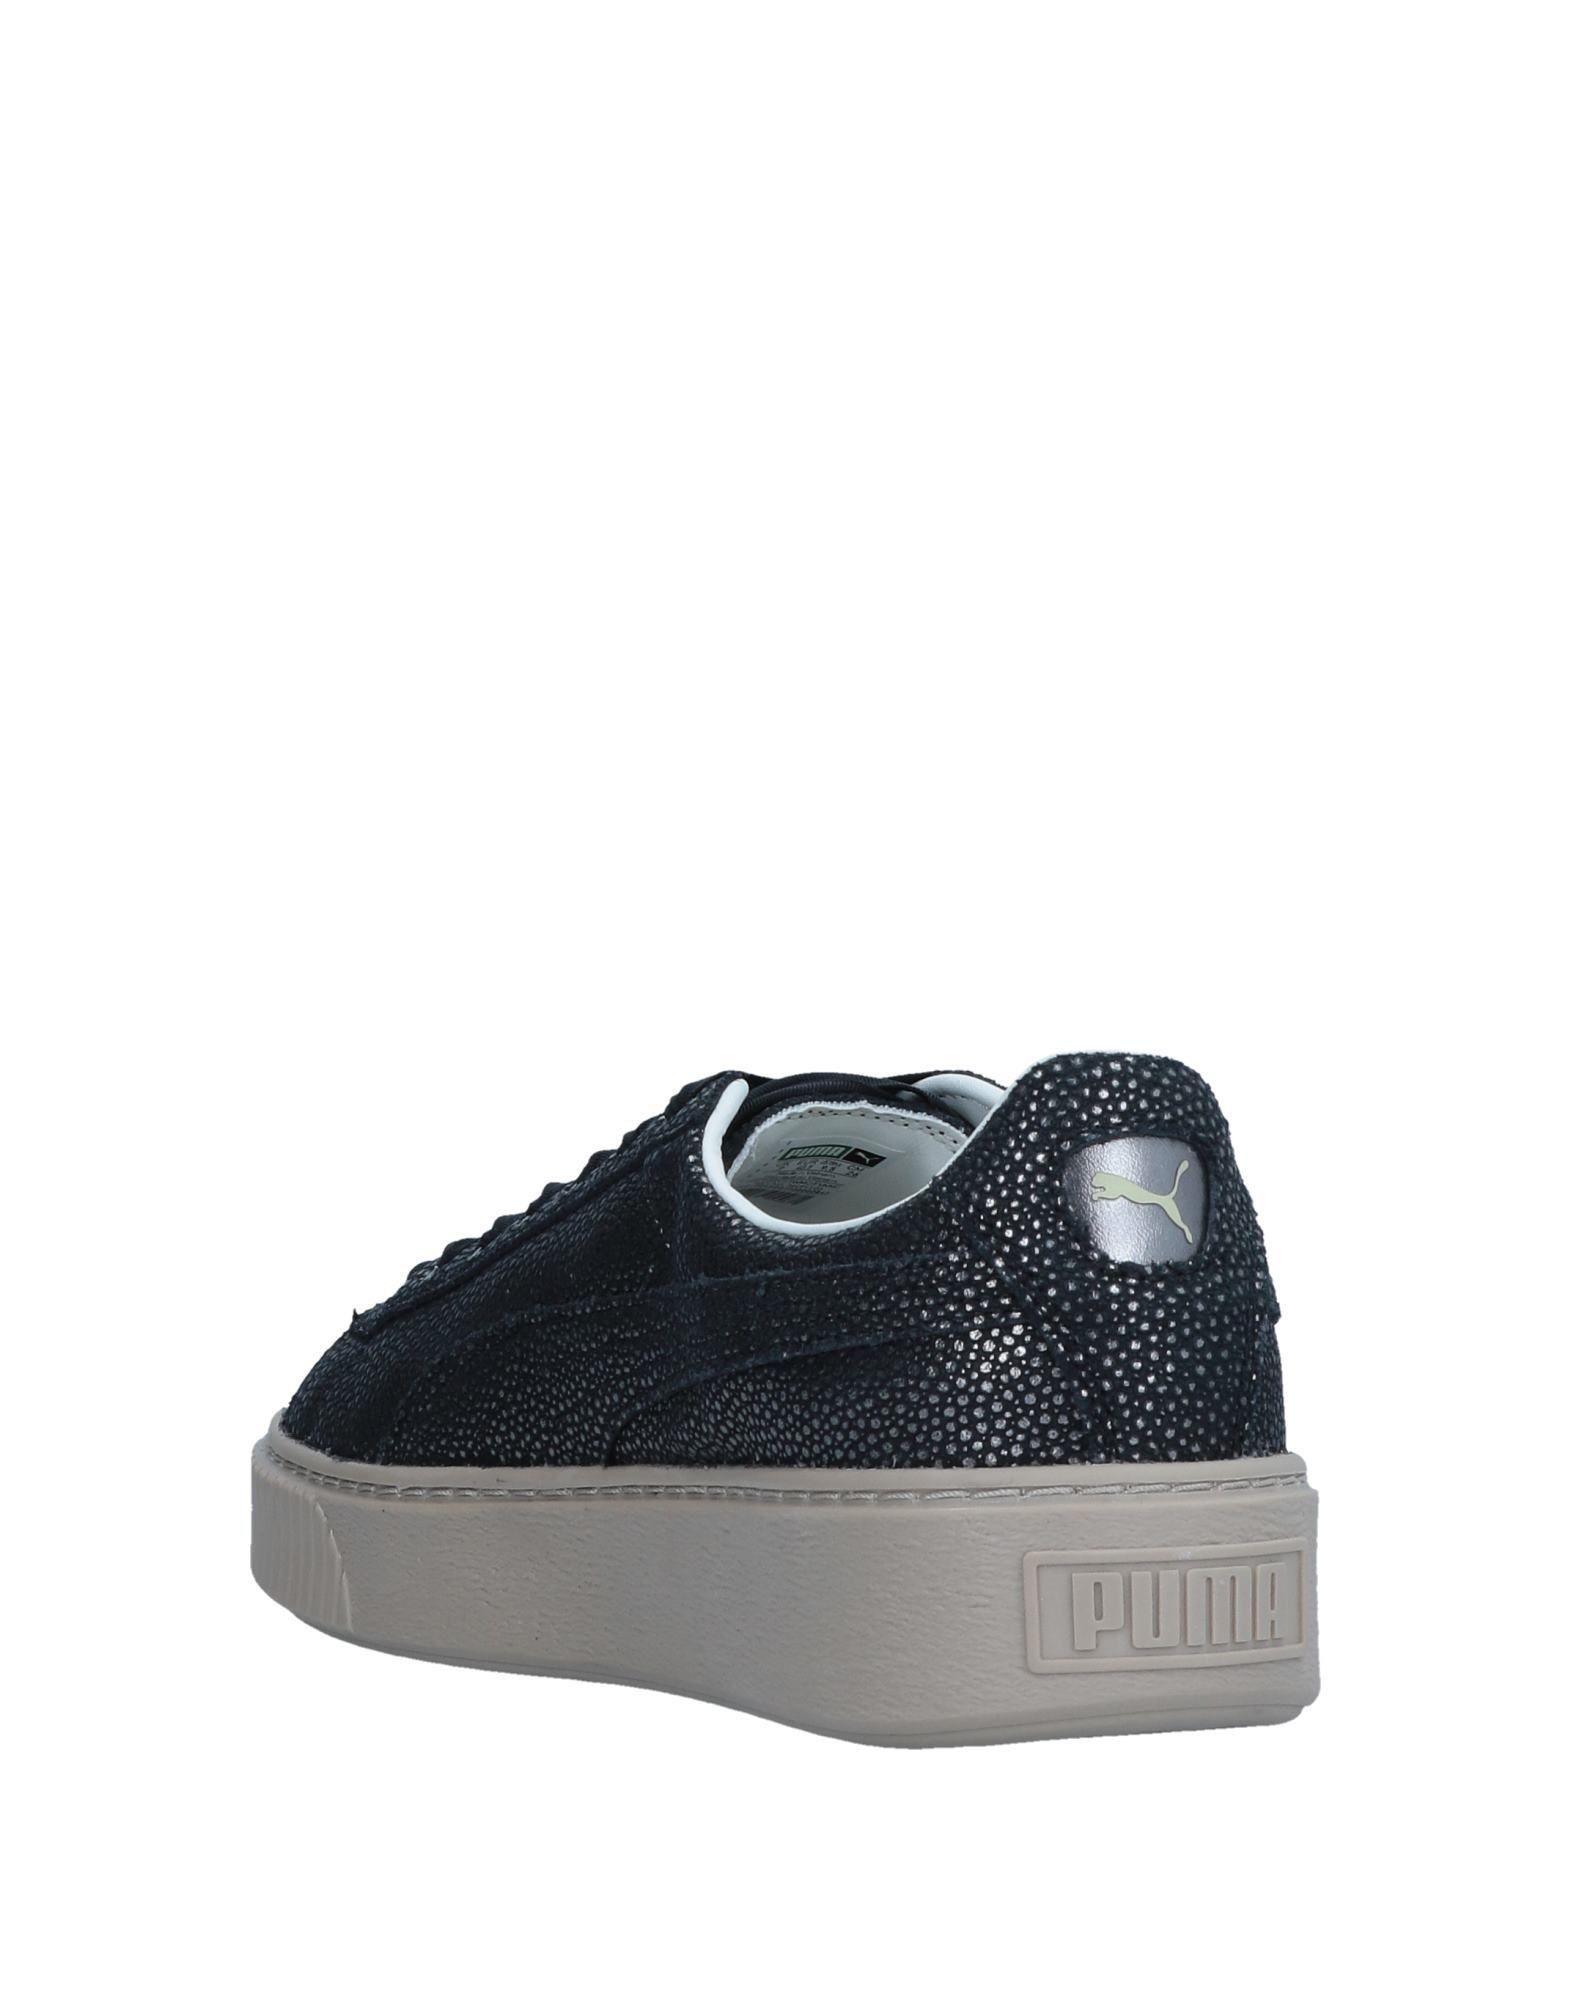 Puma Sneakers - Women Puma Sneakers online on    United Kingdom - 11557983PV 810914